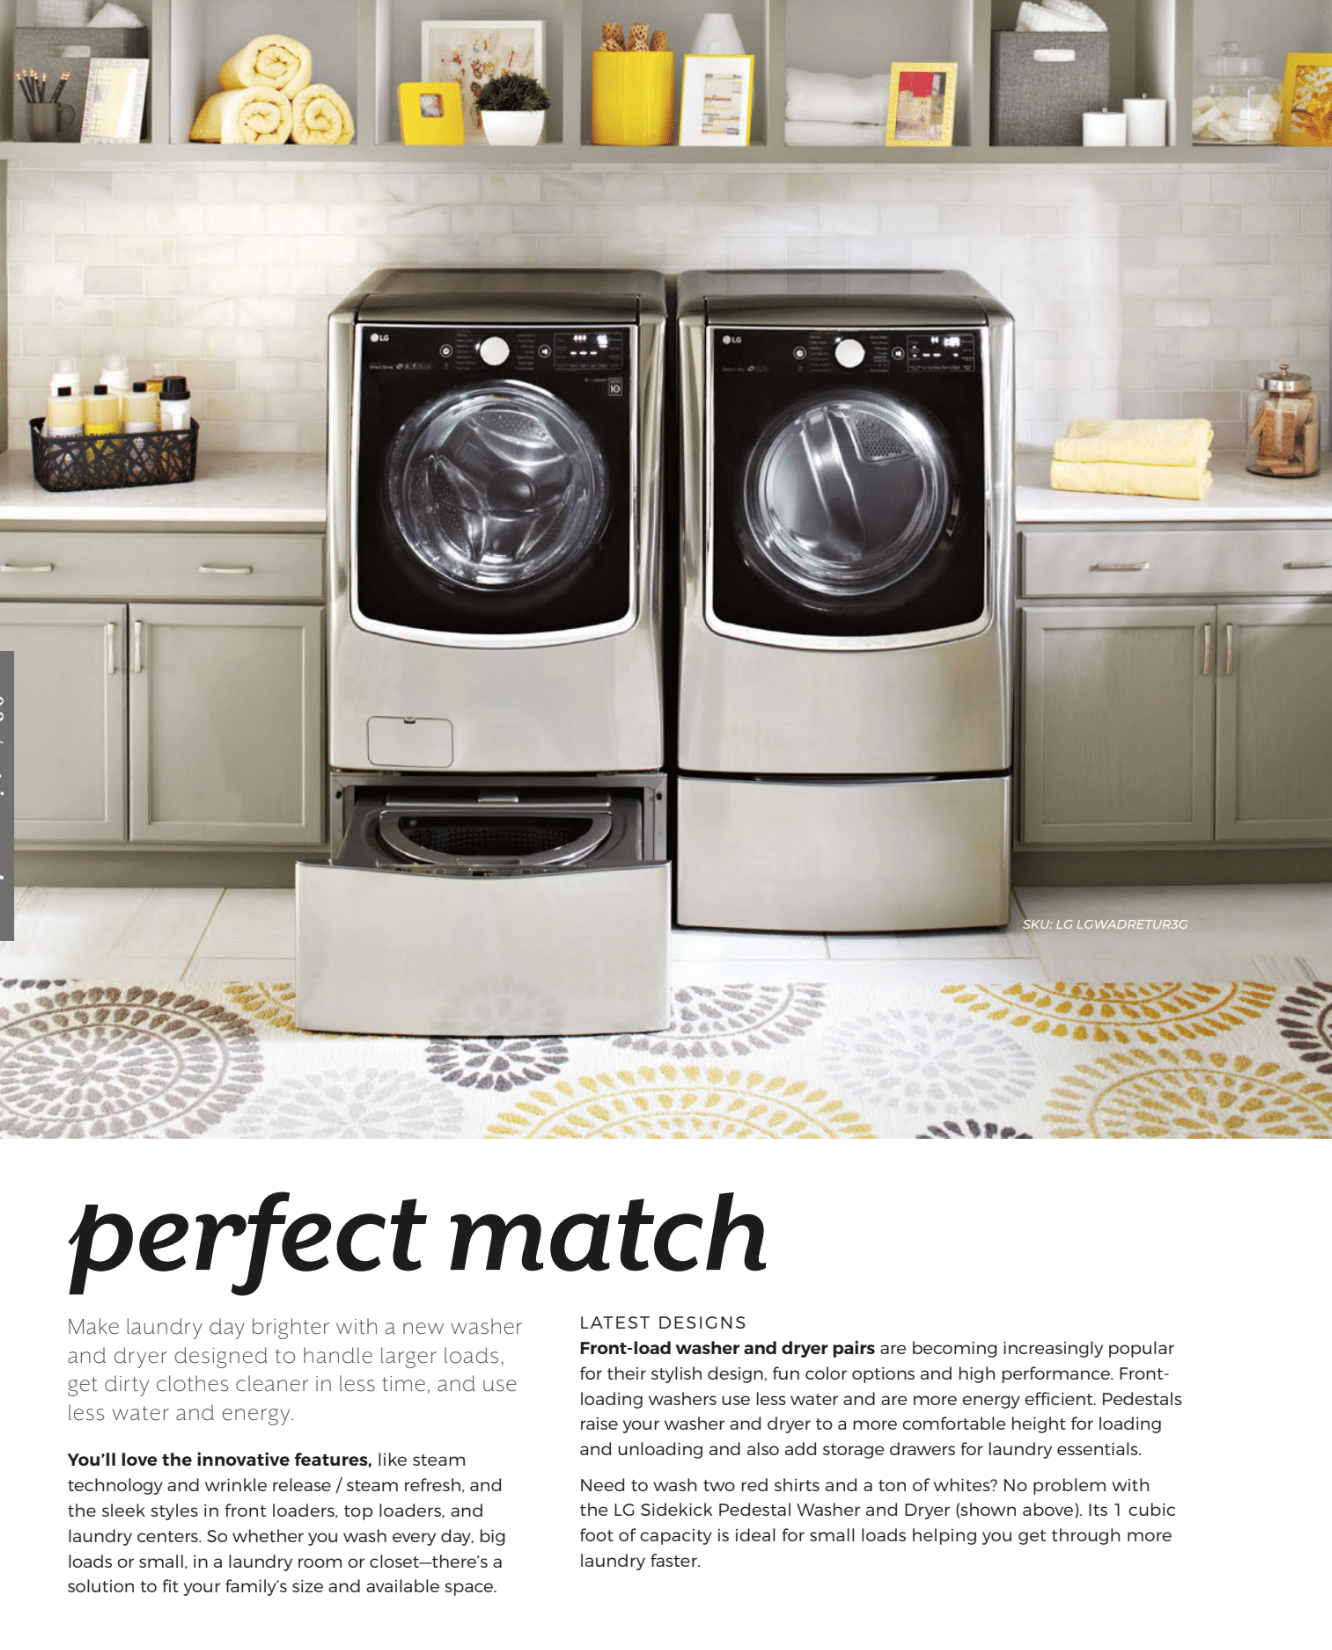 Pin By Aj Madison On Brand I Ajm Magazine Buying Appliances